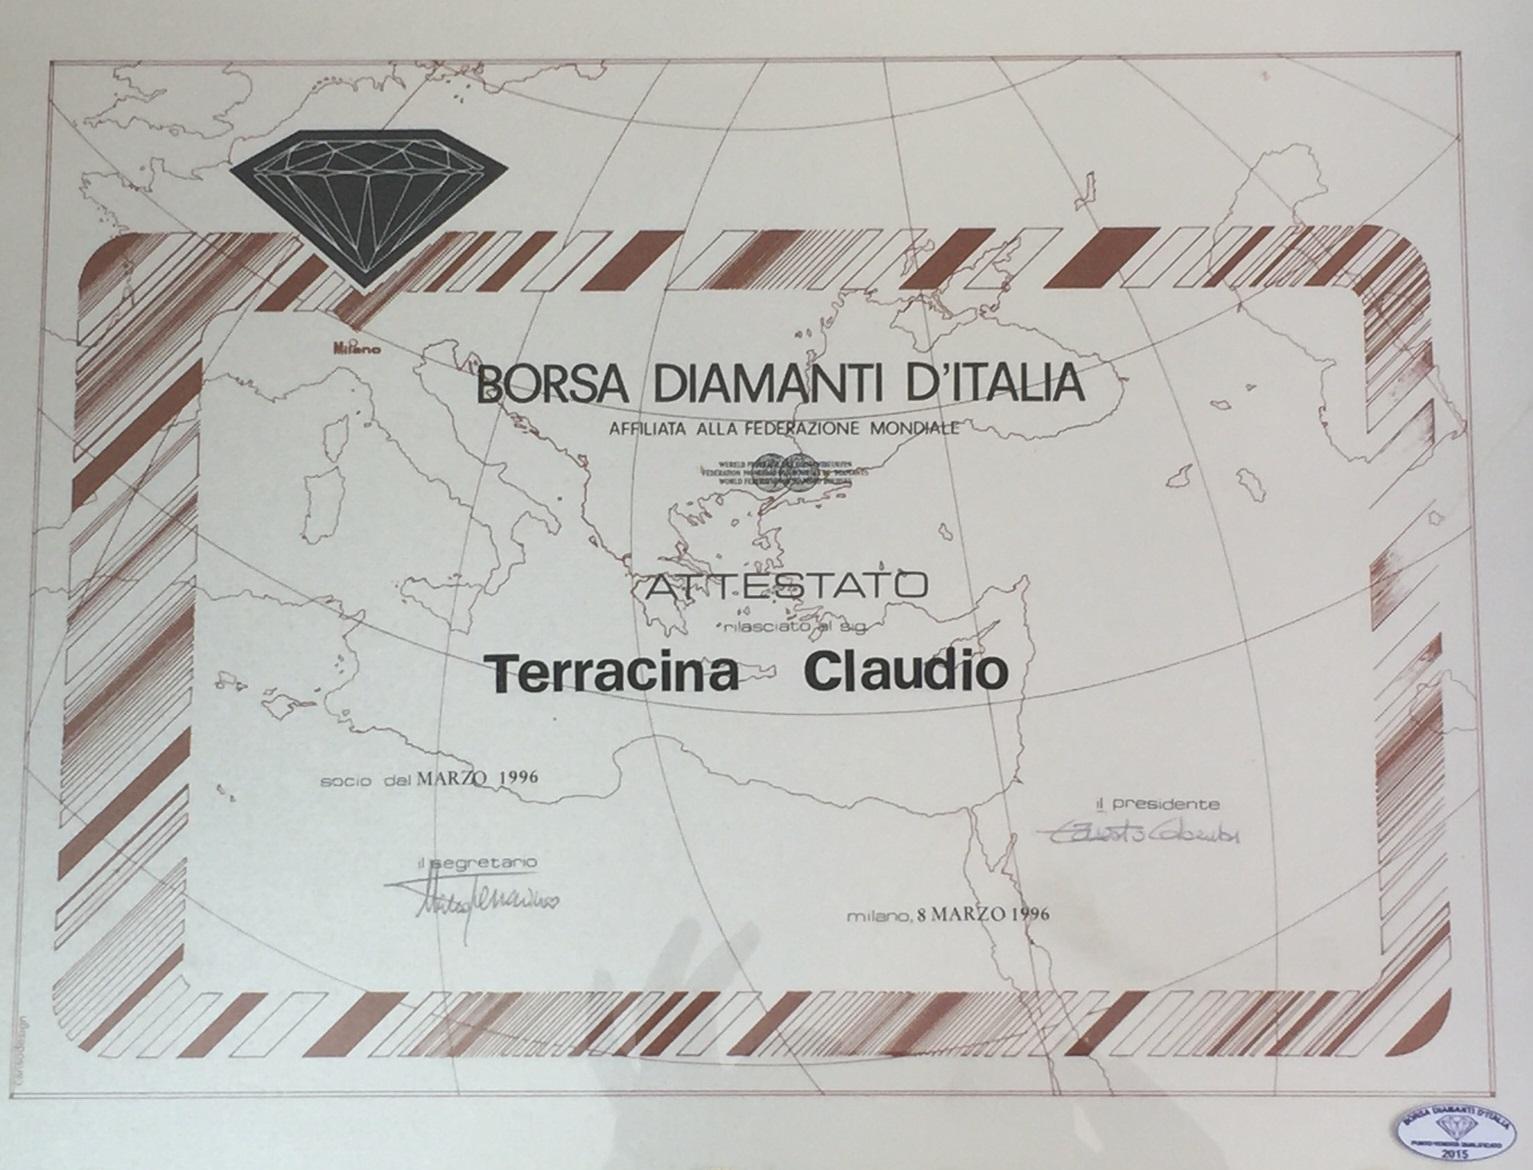 Attestato borsa diamanti italia terracina claudio